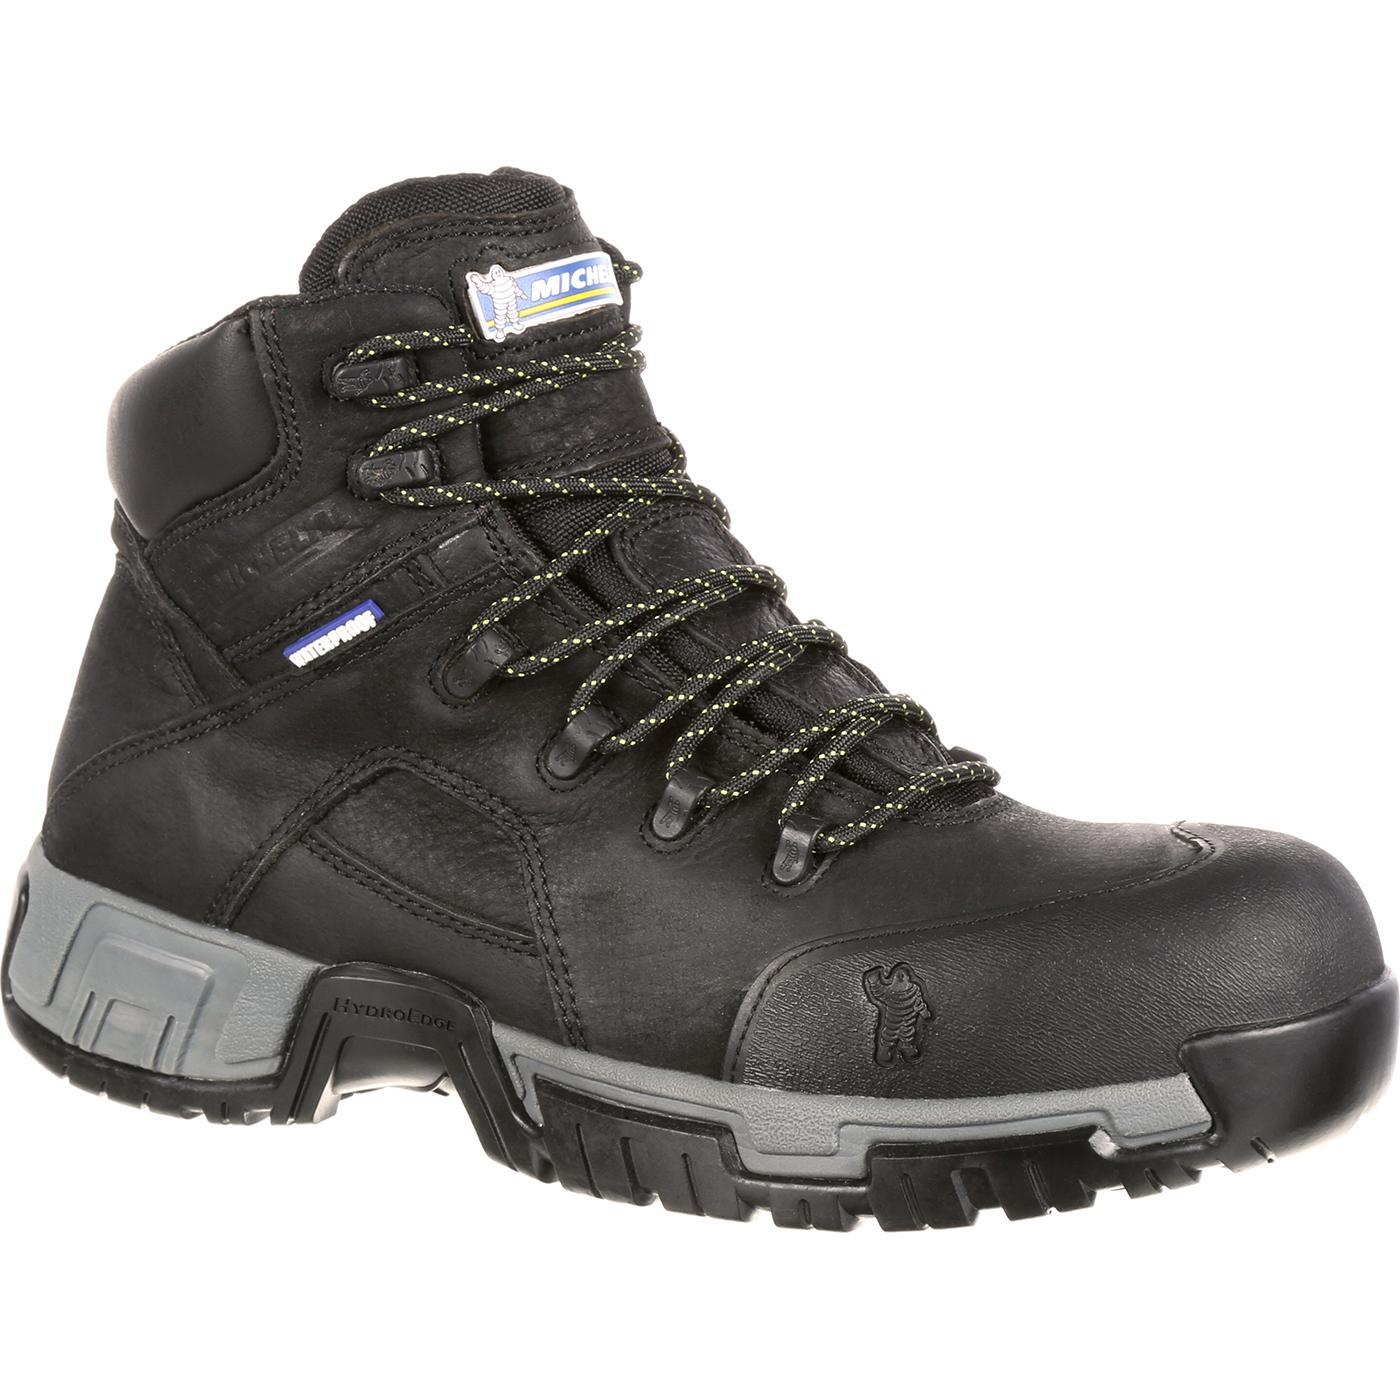 8f477420df63 Michelin® HydroEdge Steel Toe Puncture-Resistant Waterproof Work Boot